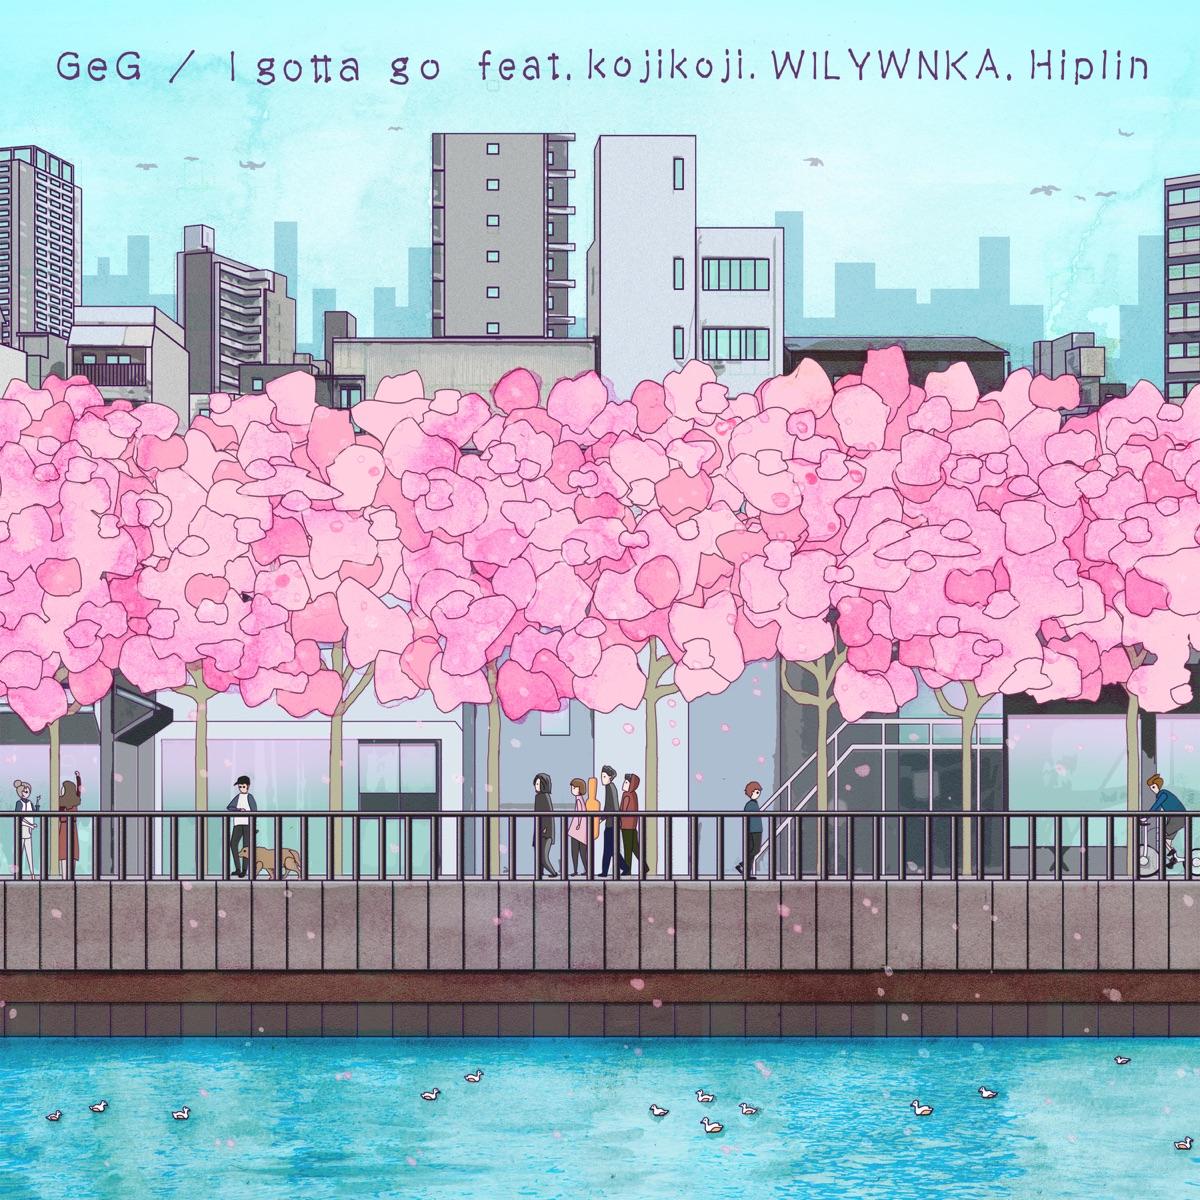 『GeG - I gotta go feat. kojikoji, WILYWNKA & Hiplin』収録の『I gotta go feat. kojikoji, WILYWNKA & Hiplin』ジャケット